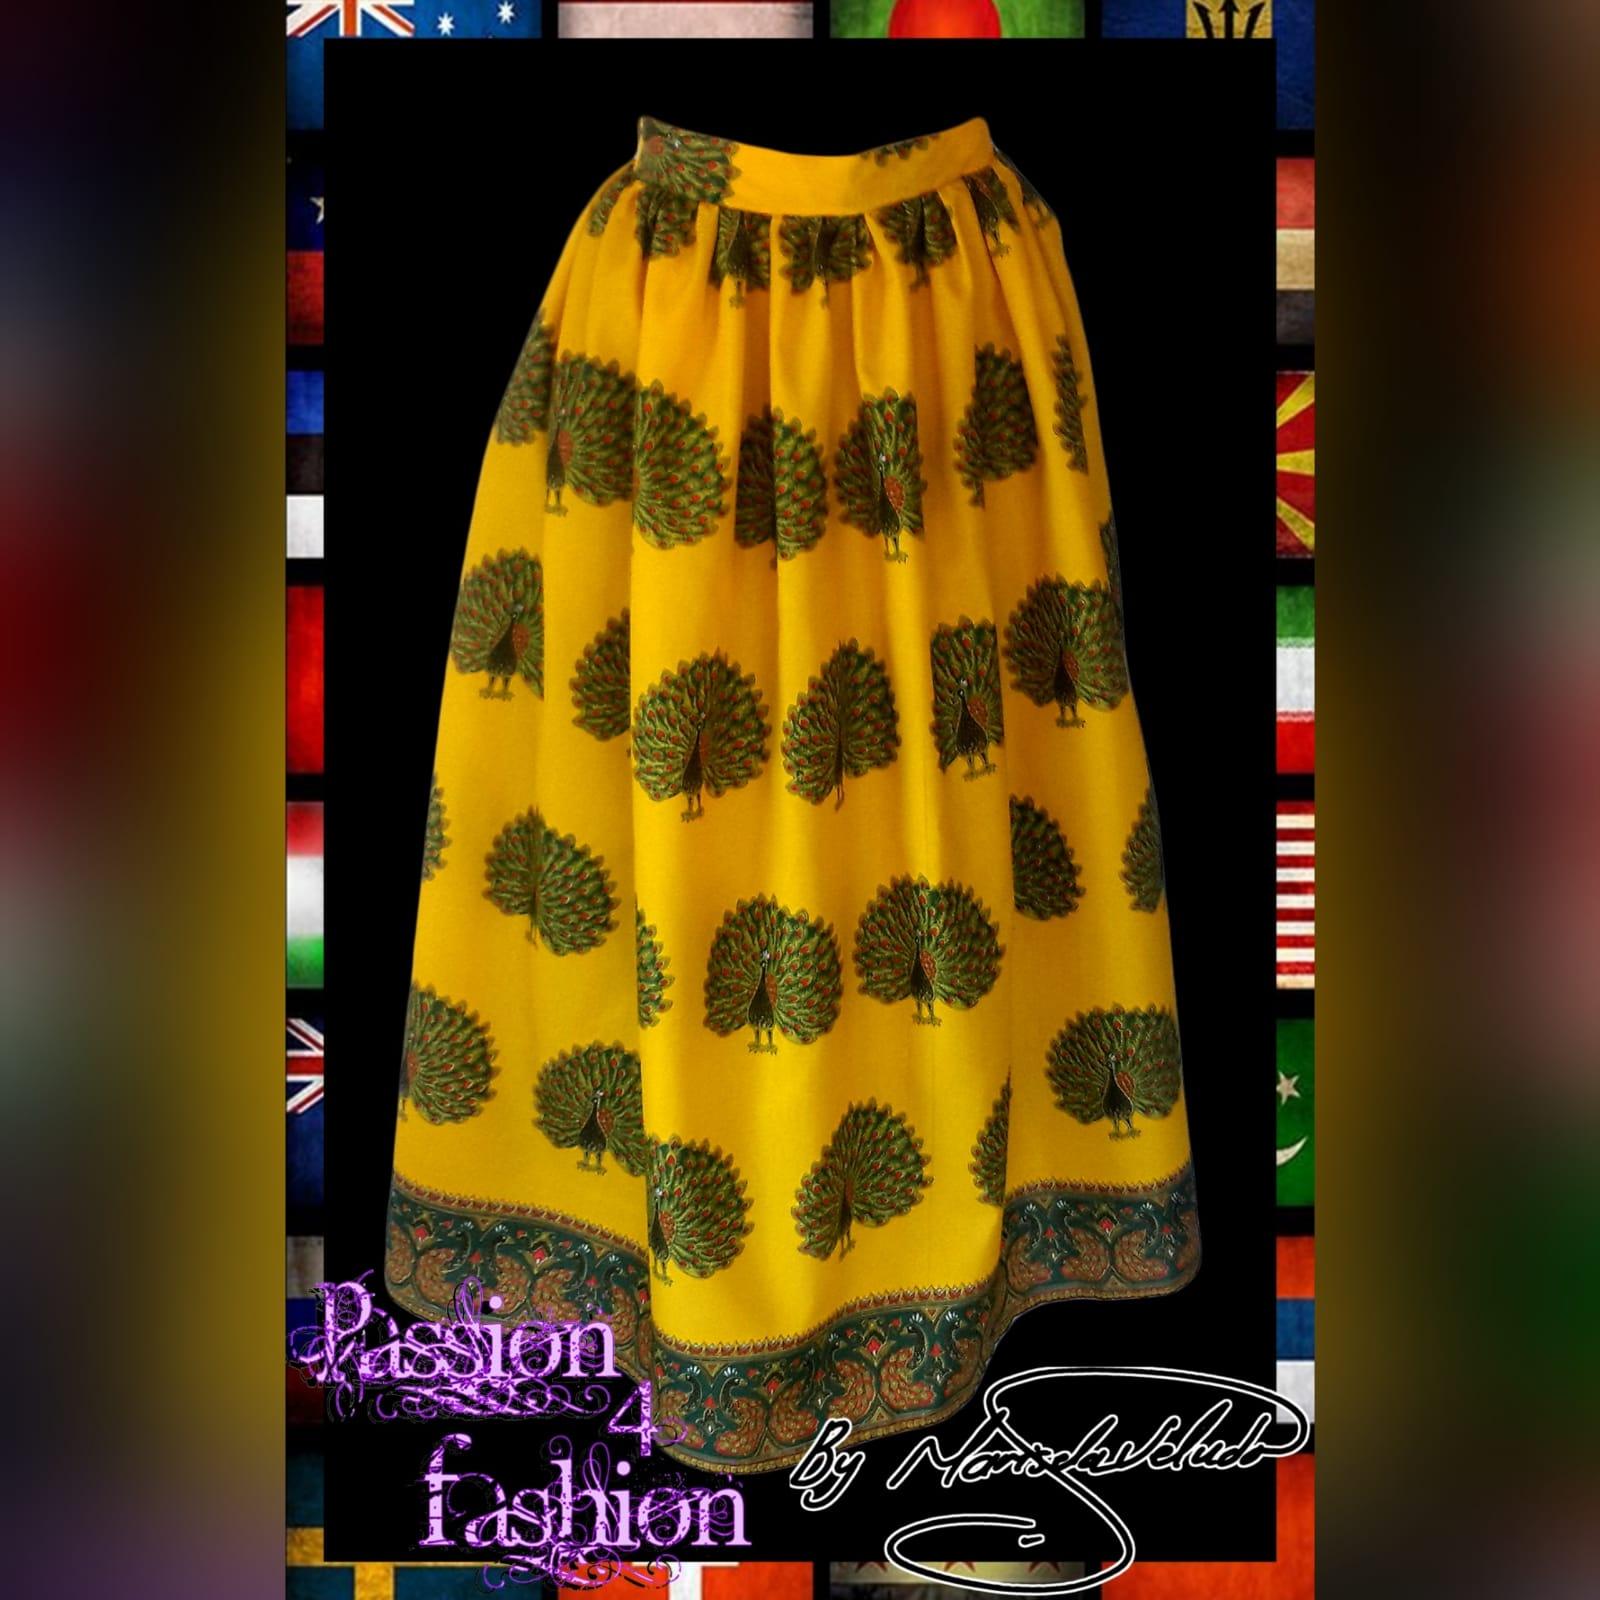 Saia reunida amarela tradicional 1 saia reunida amarela tradicional comprimento longo / tornozelo